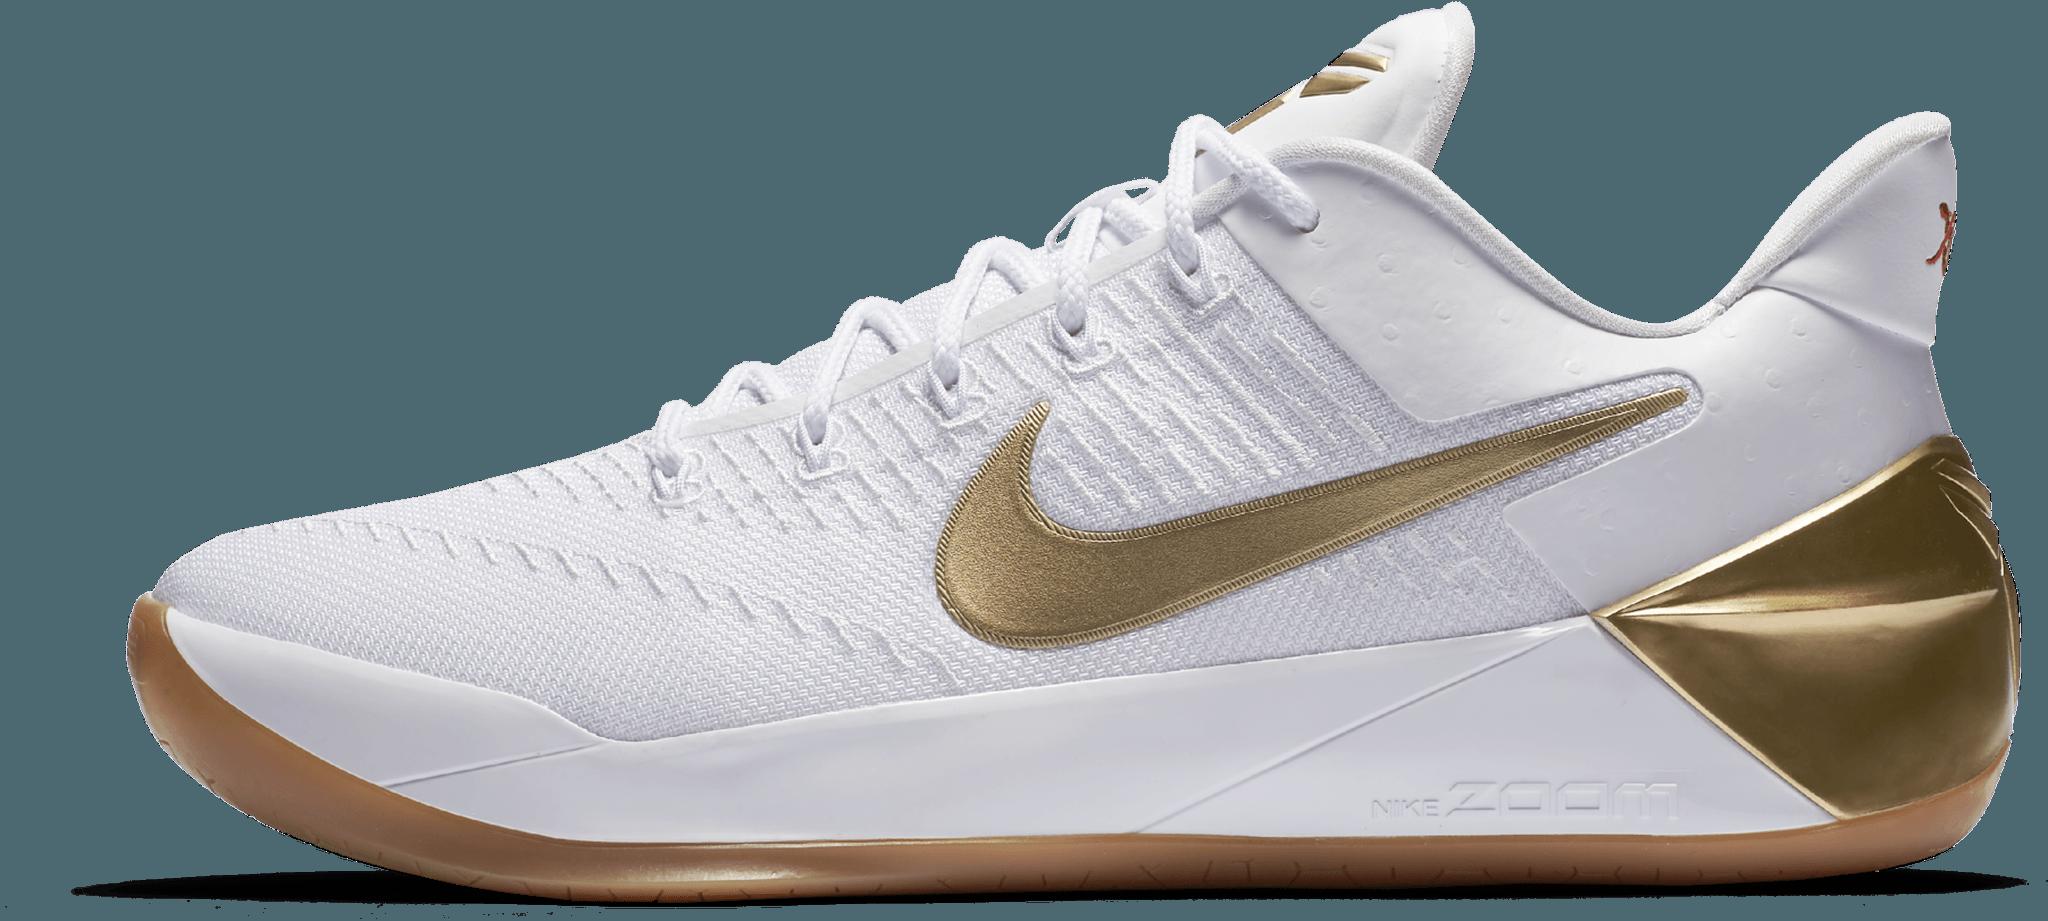 Nike Kobe AD Performance Review